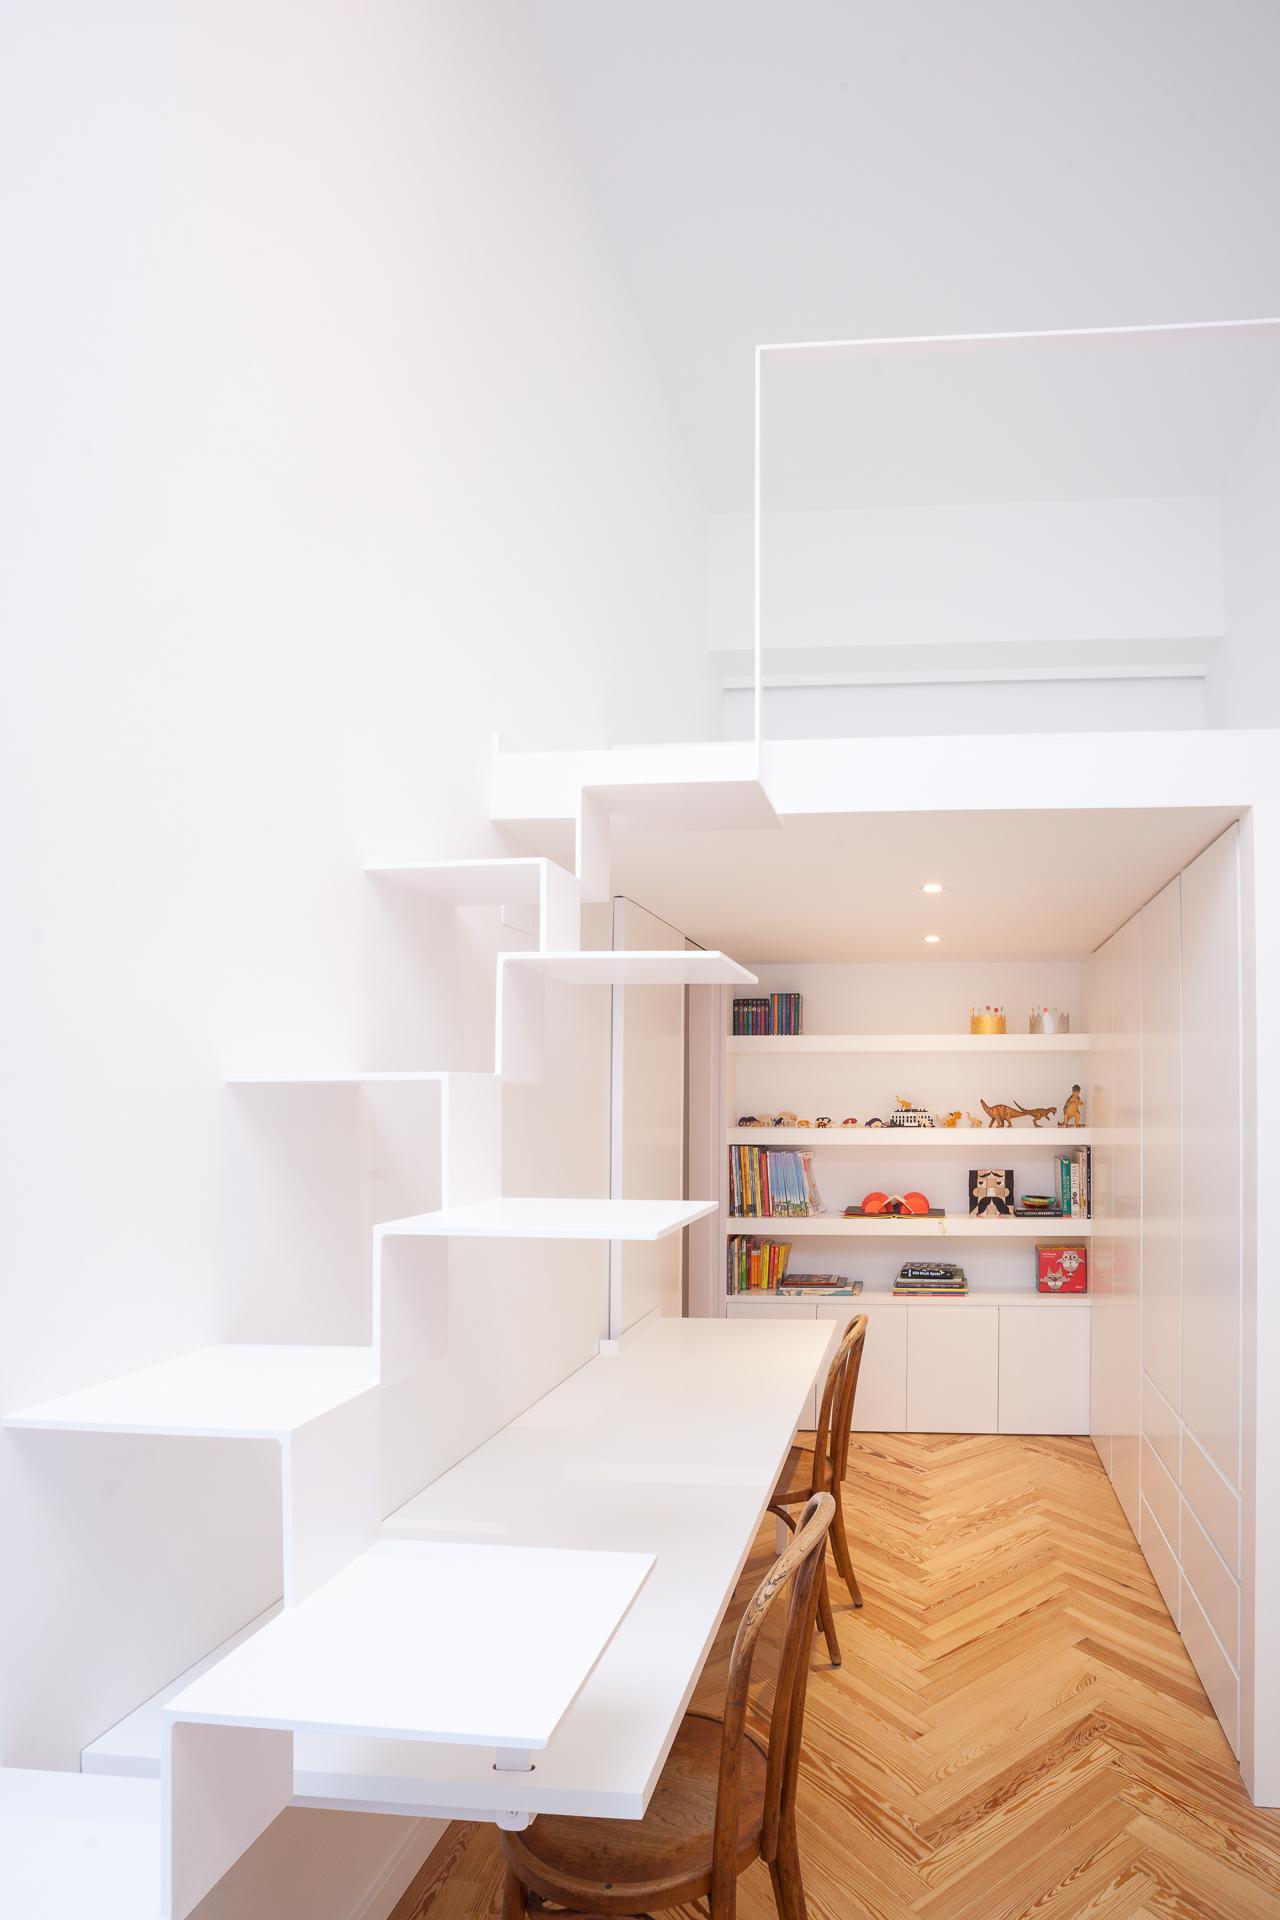 SALESAS_Maroto_Ibañez_arquitectos10